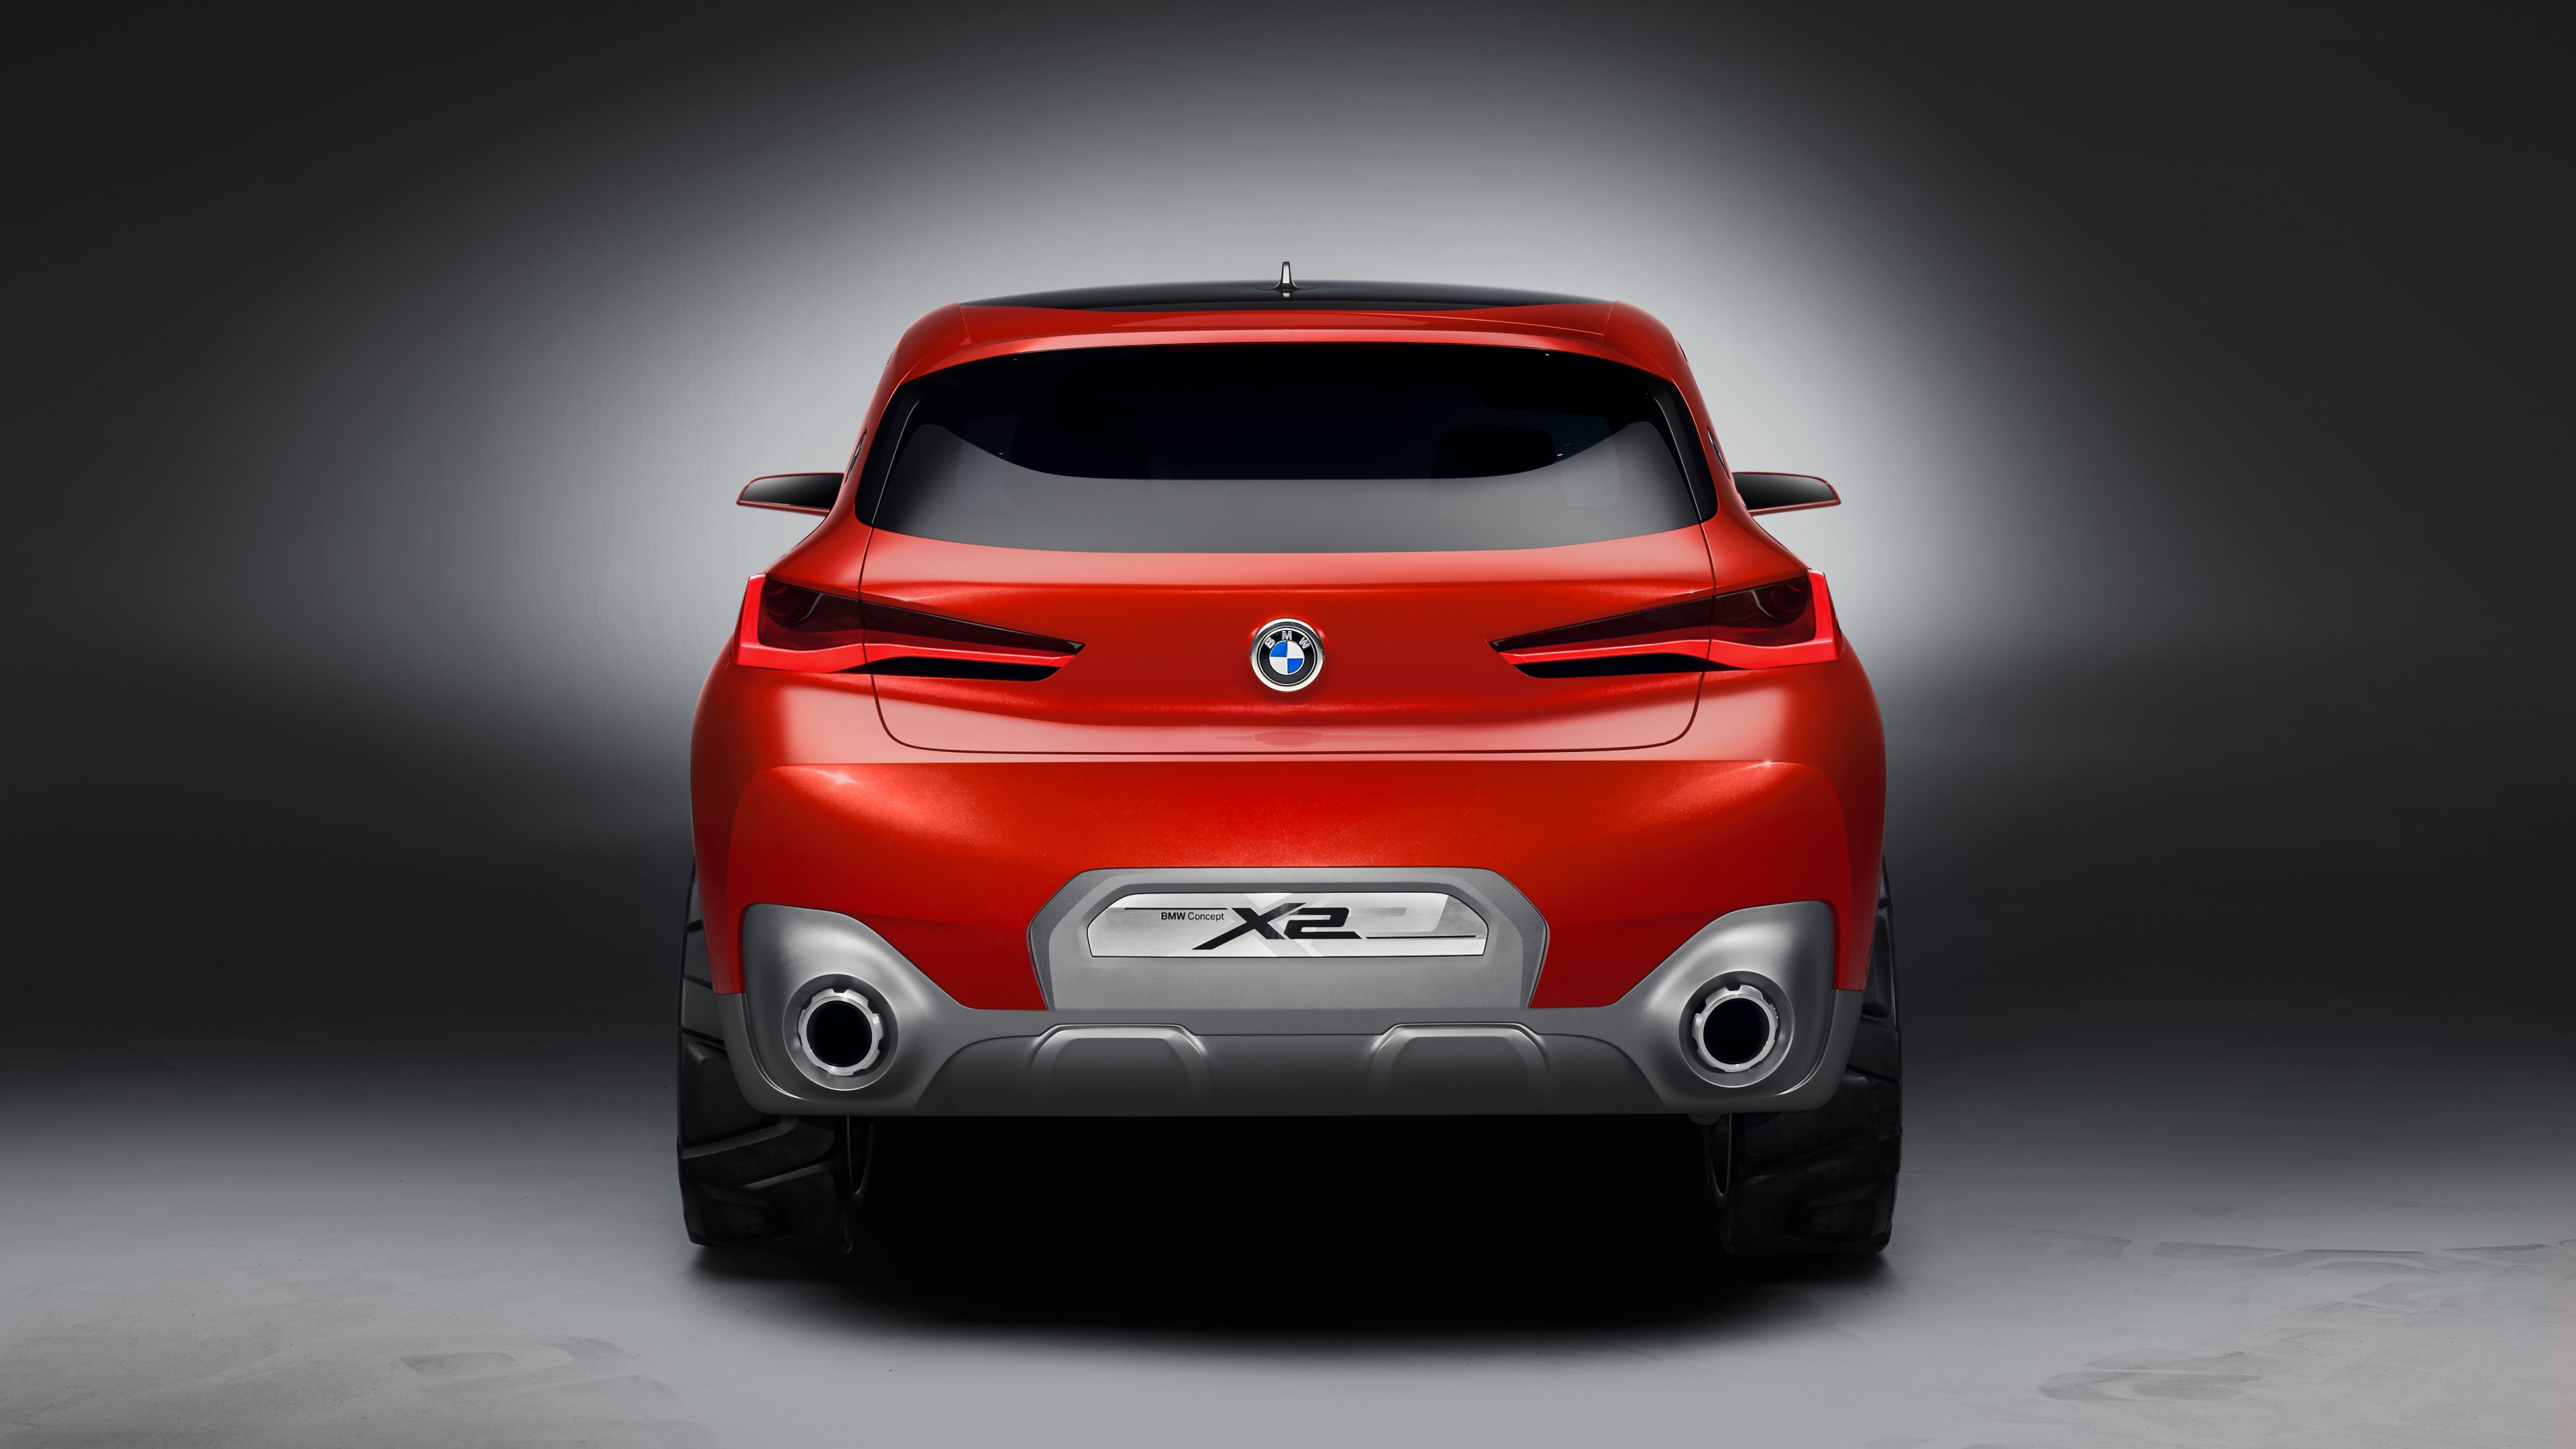 2018 Bmw X2 Concept 3 Wallpaper Hd Car Wallpapers Id 7313